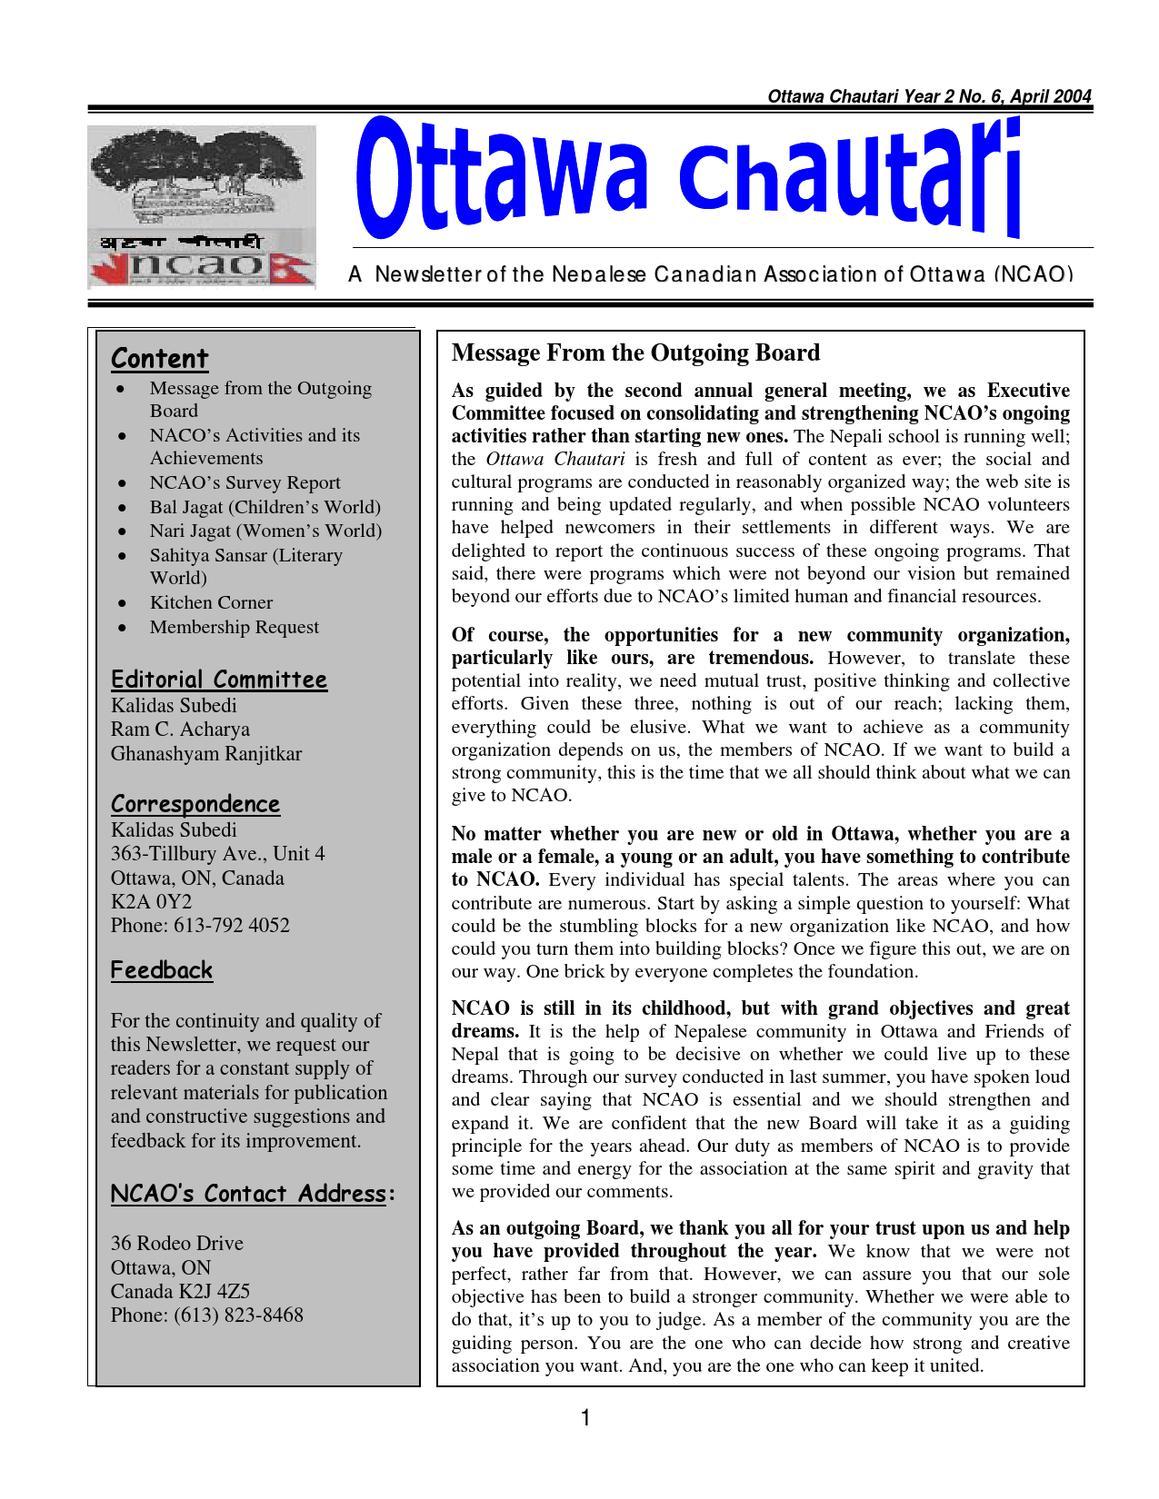 Ottawa Chautari - Volume 6 (April 2004) by NCAO Canada - issuu